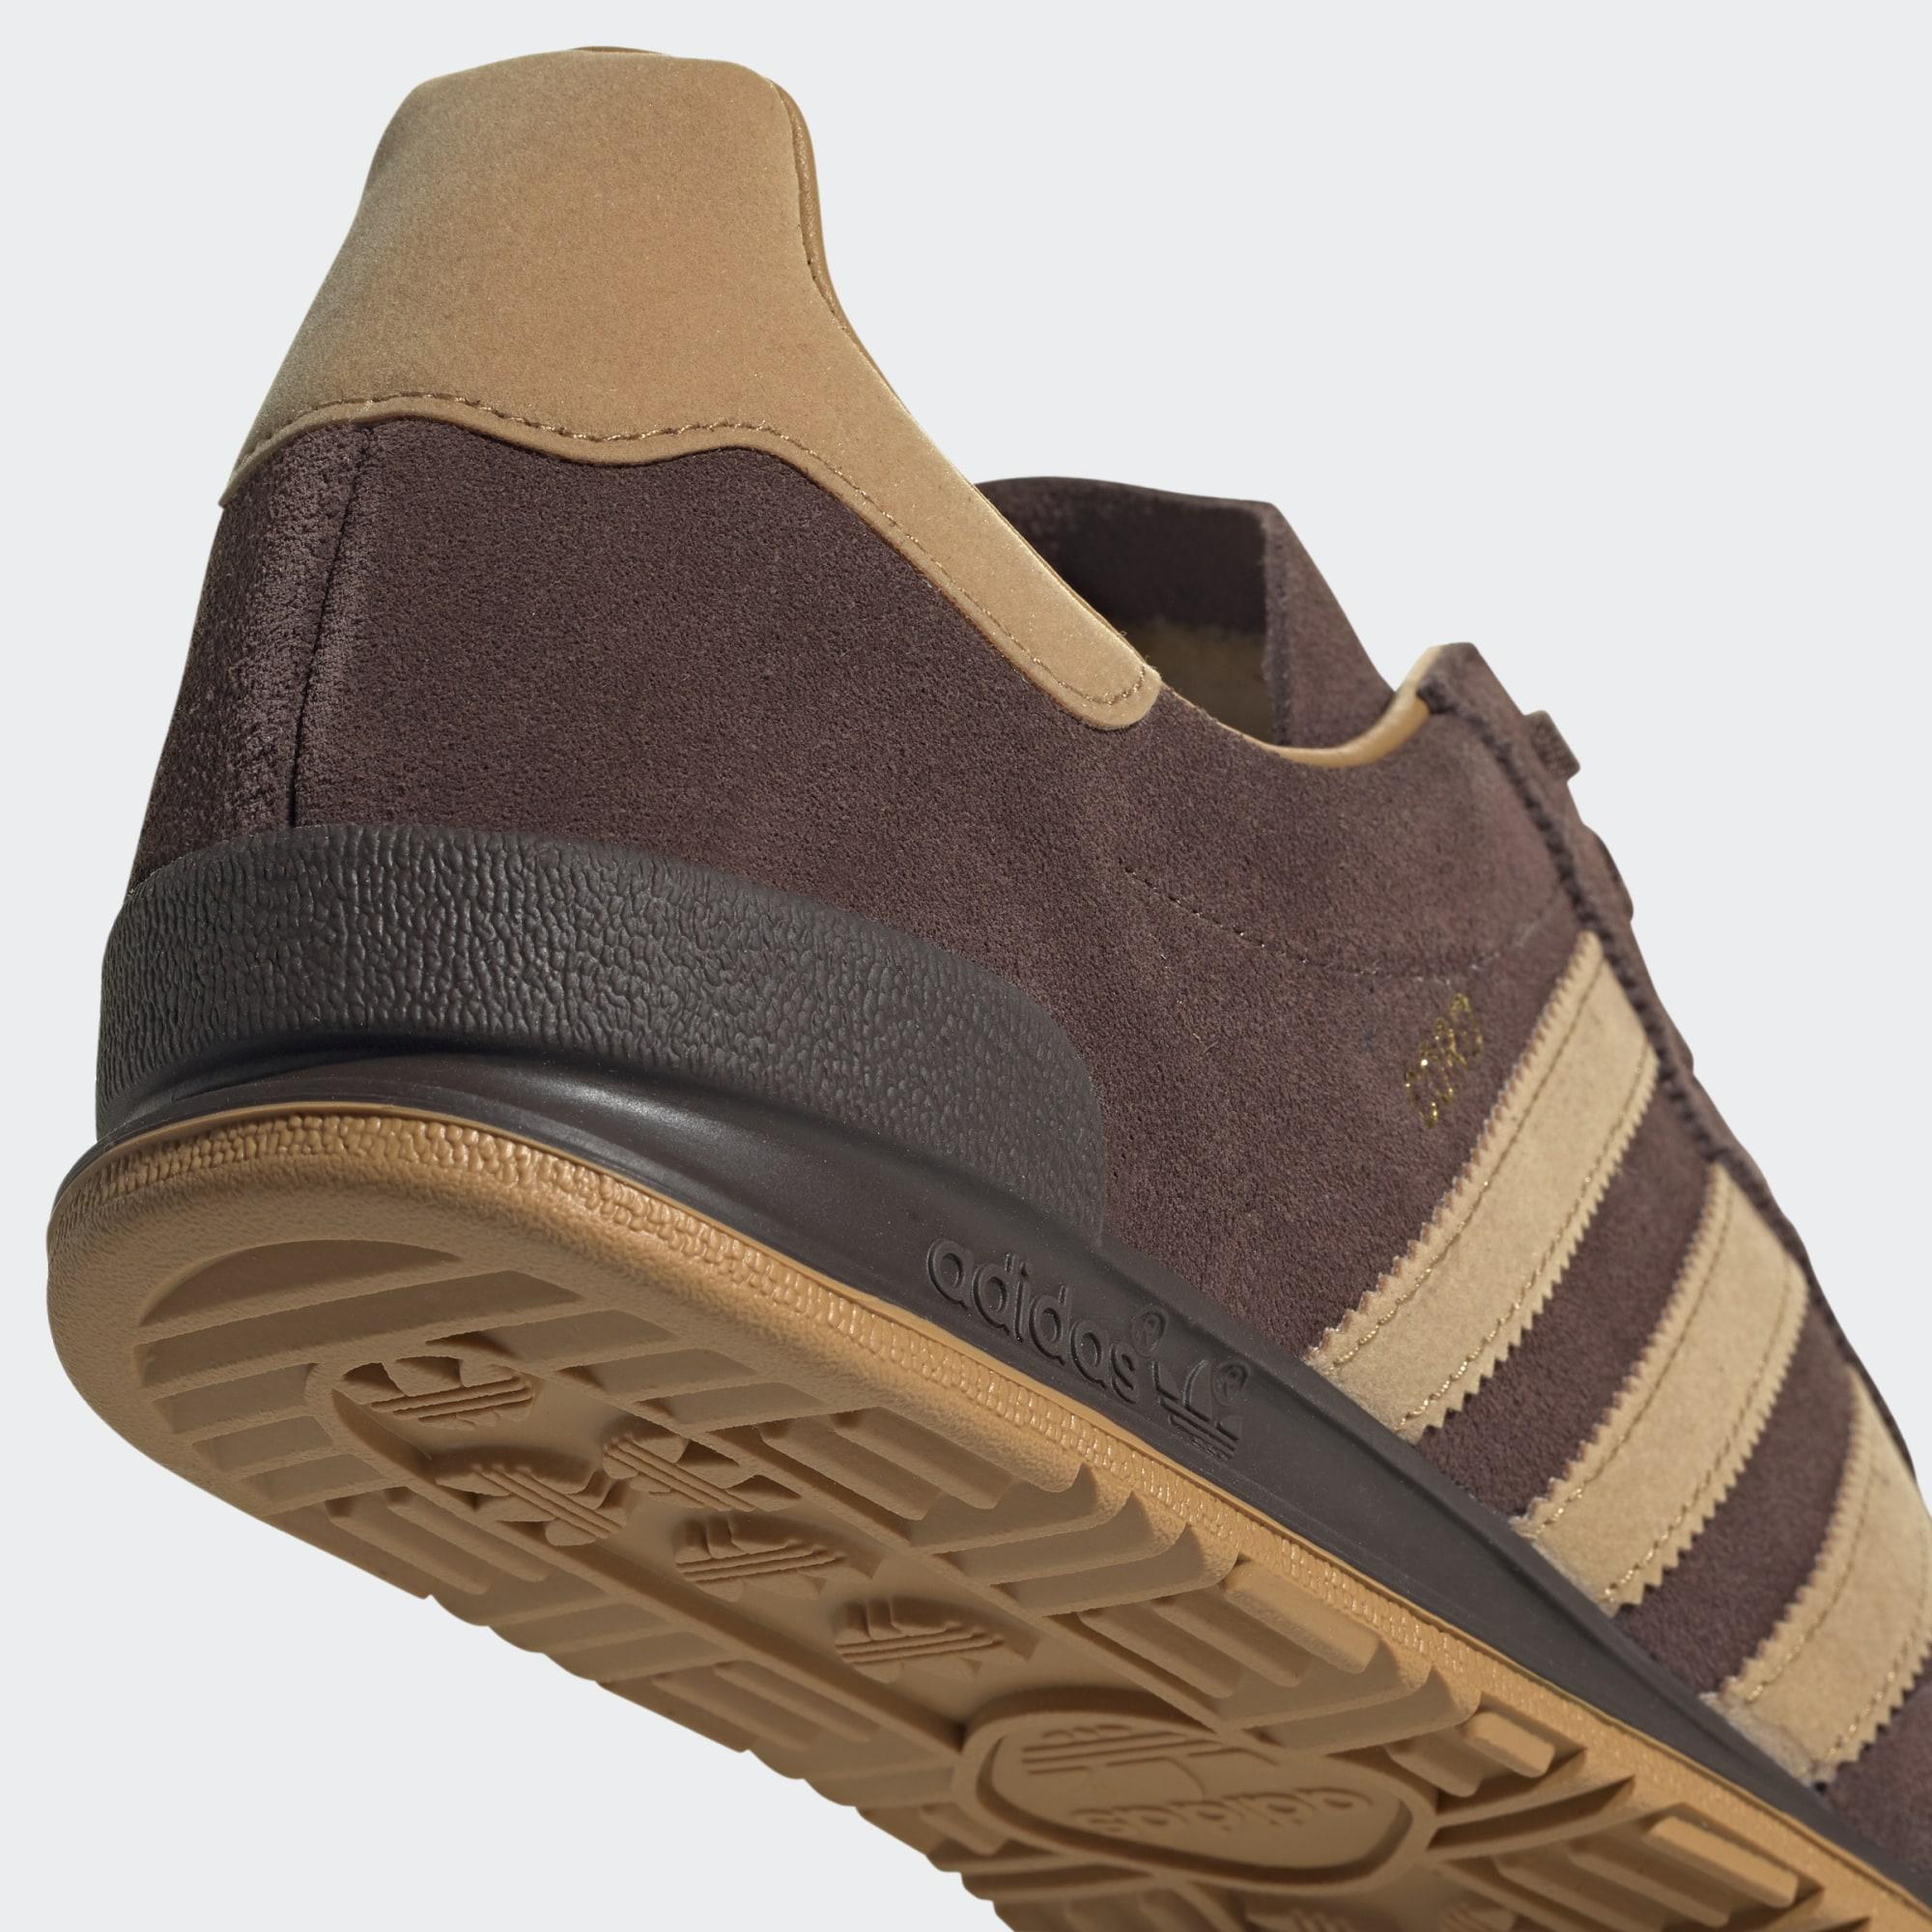 Cord_Shoes_Brun_H67630_41_detail.jpg